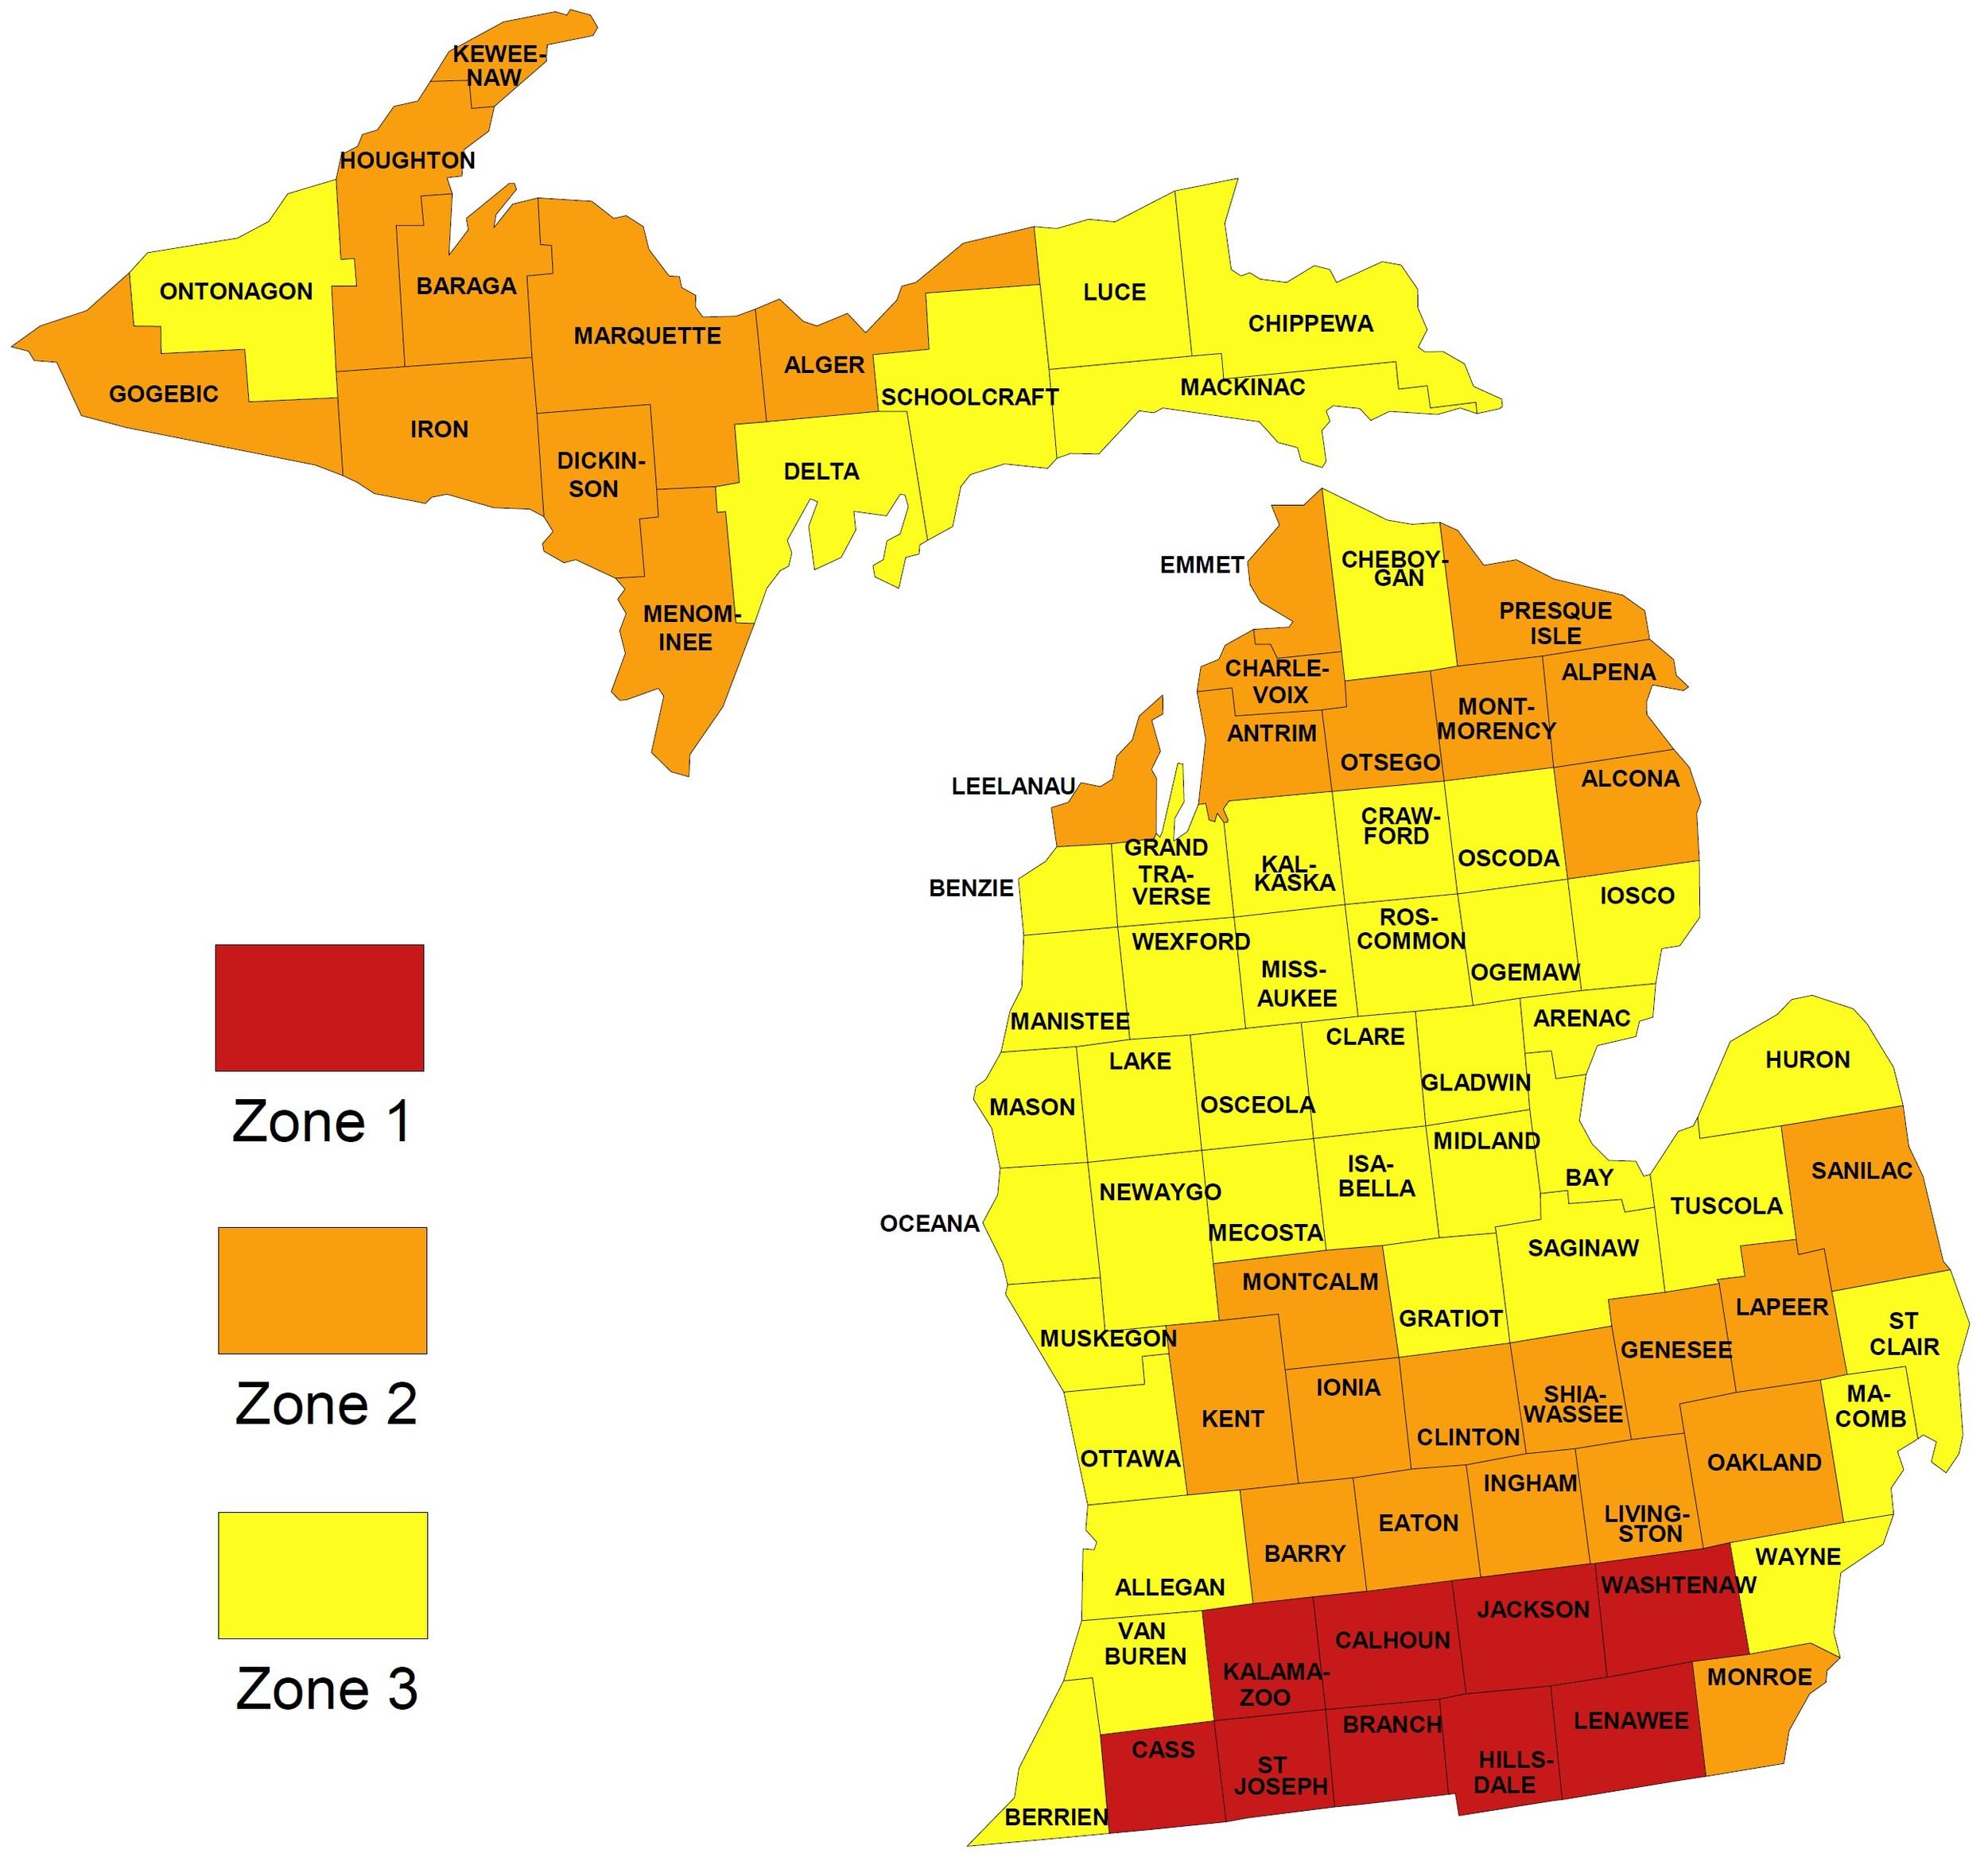 Map Source:www.epa.gov/radon/states/michigan.html